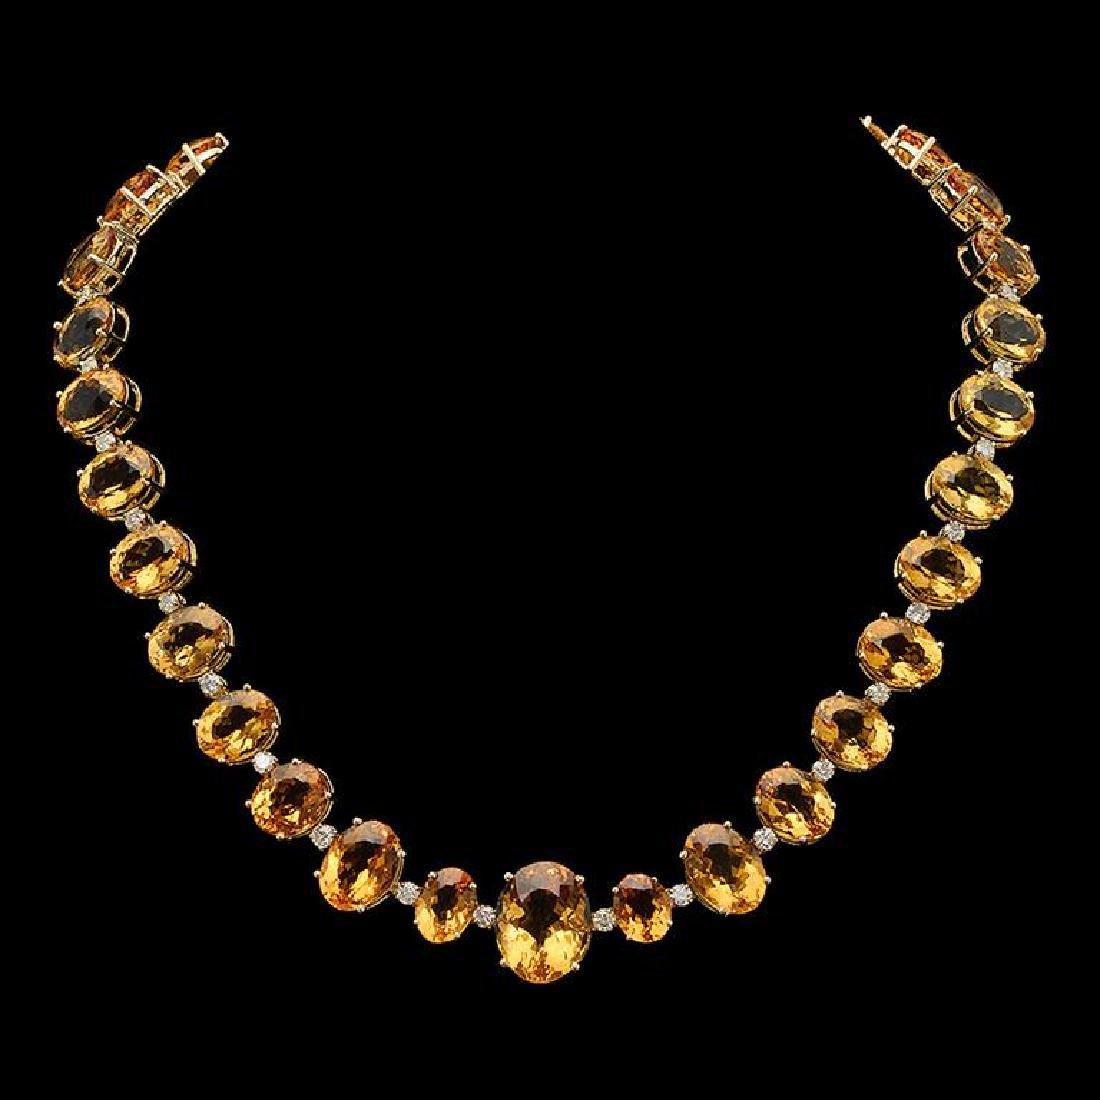 14K Gold 141.39ct Citrine 4.05ct Diamond Necklace